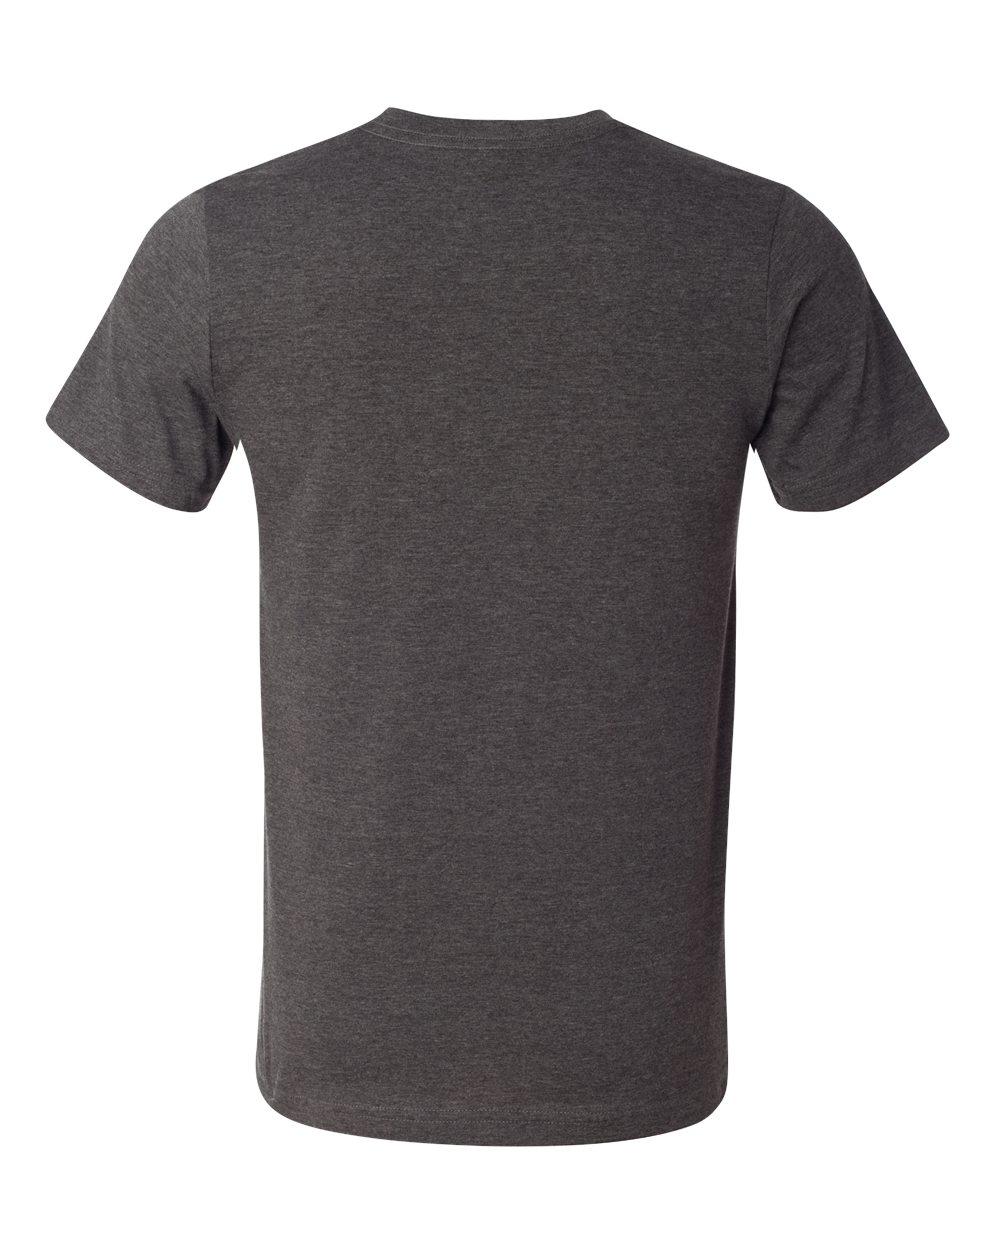 Bella-Canvas-Unisex-Made-in-USA-Jersey-Short-Sleeve-T-Shirt-3001U-XS-3XL thumbnail 25